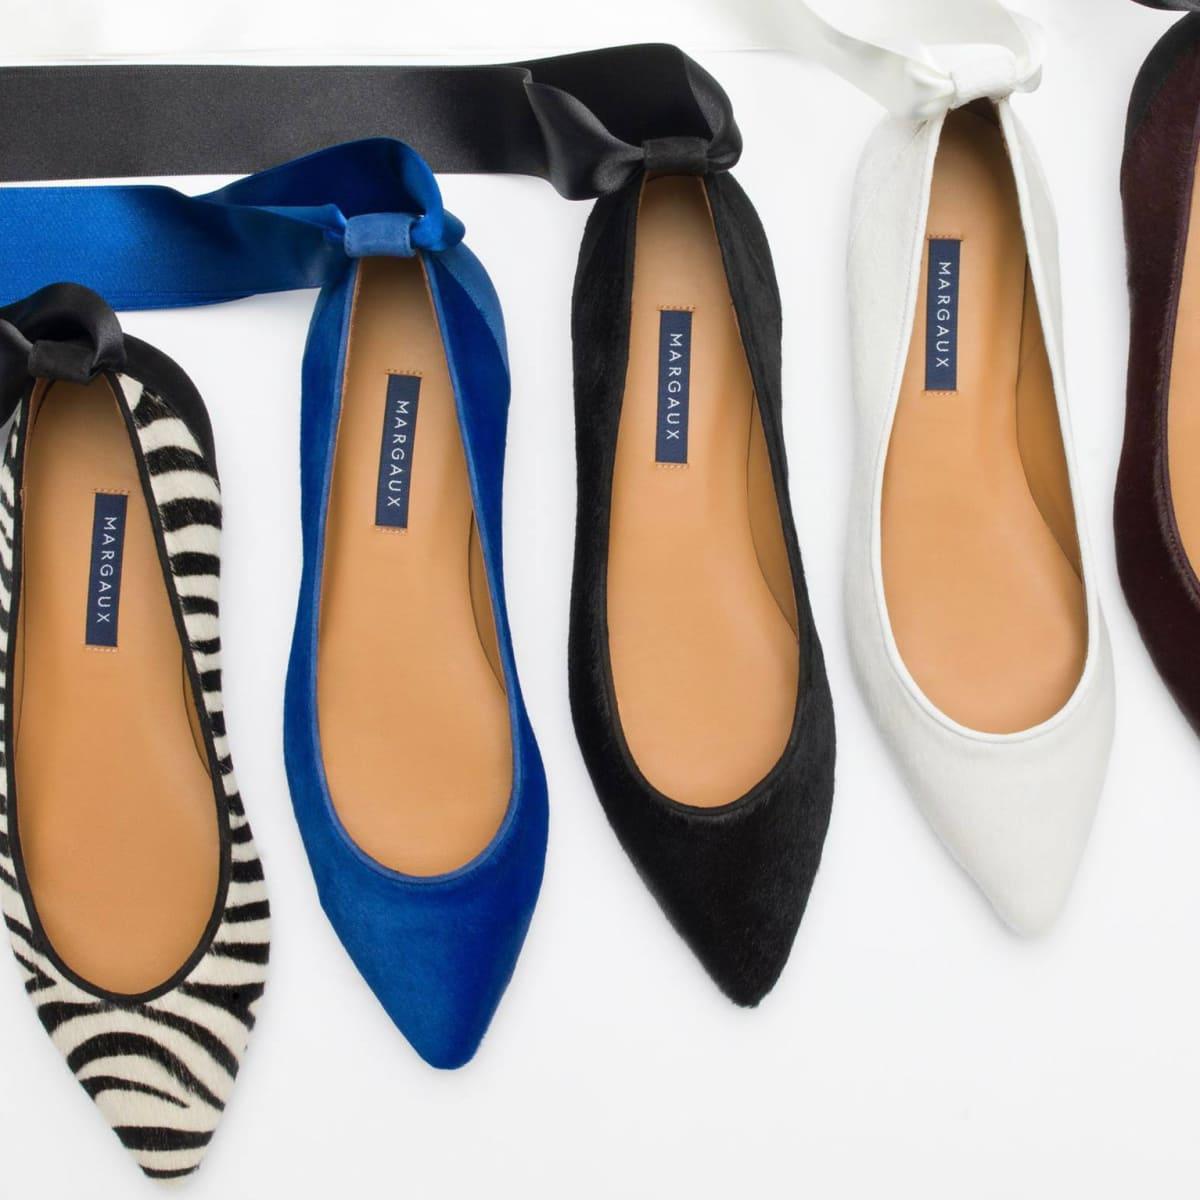 Margaux shoes